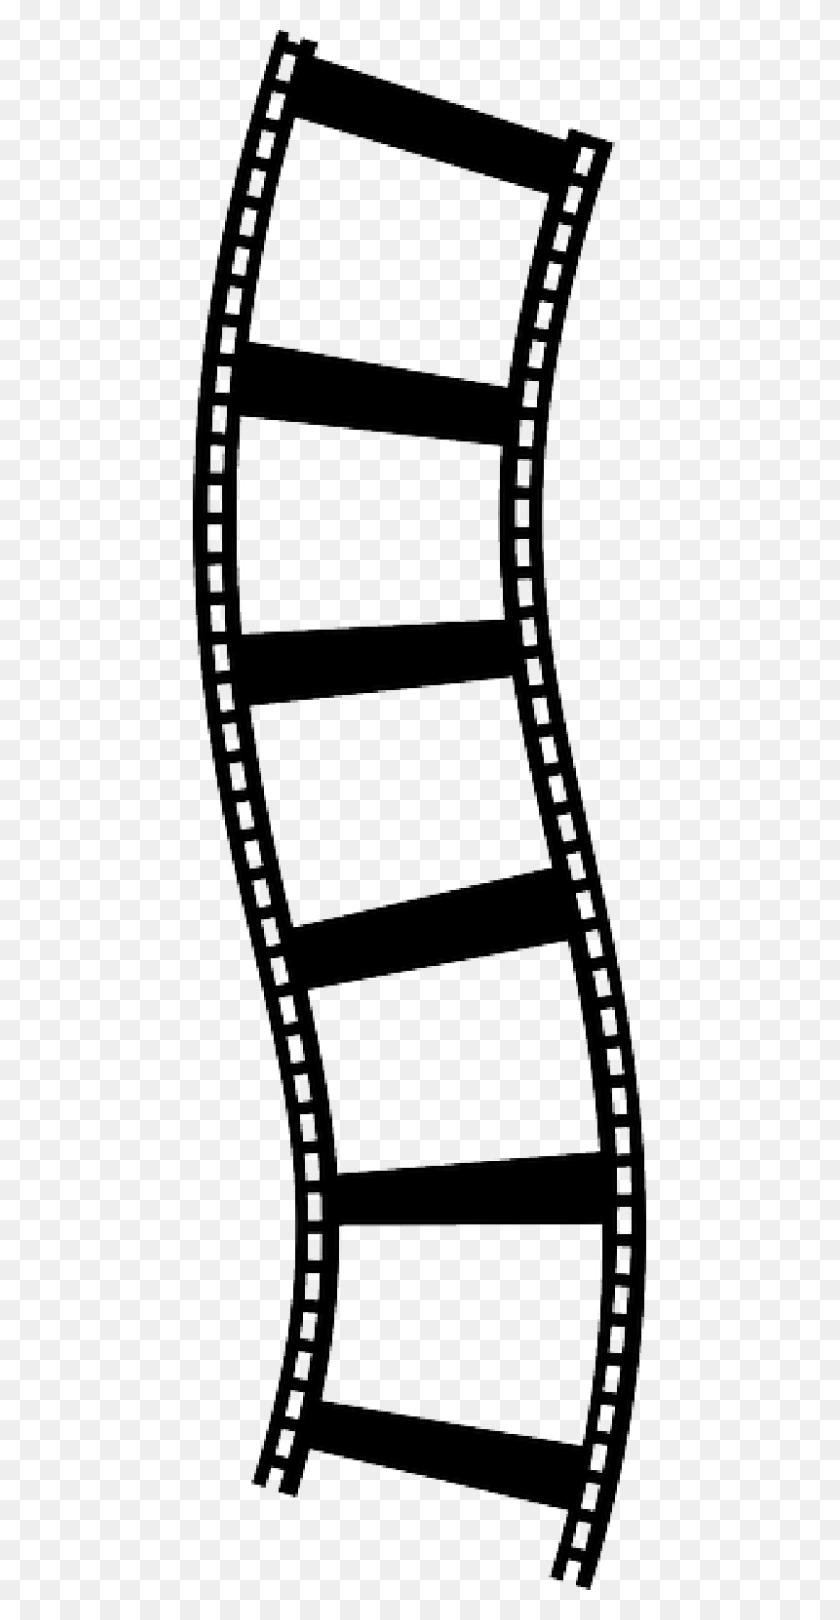 Movie Reel Movie Clip Art Download Clipartix - Movie Clapboard Clipart